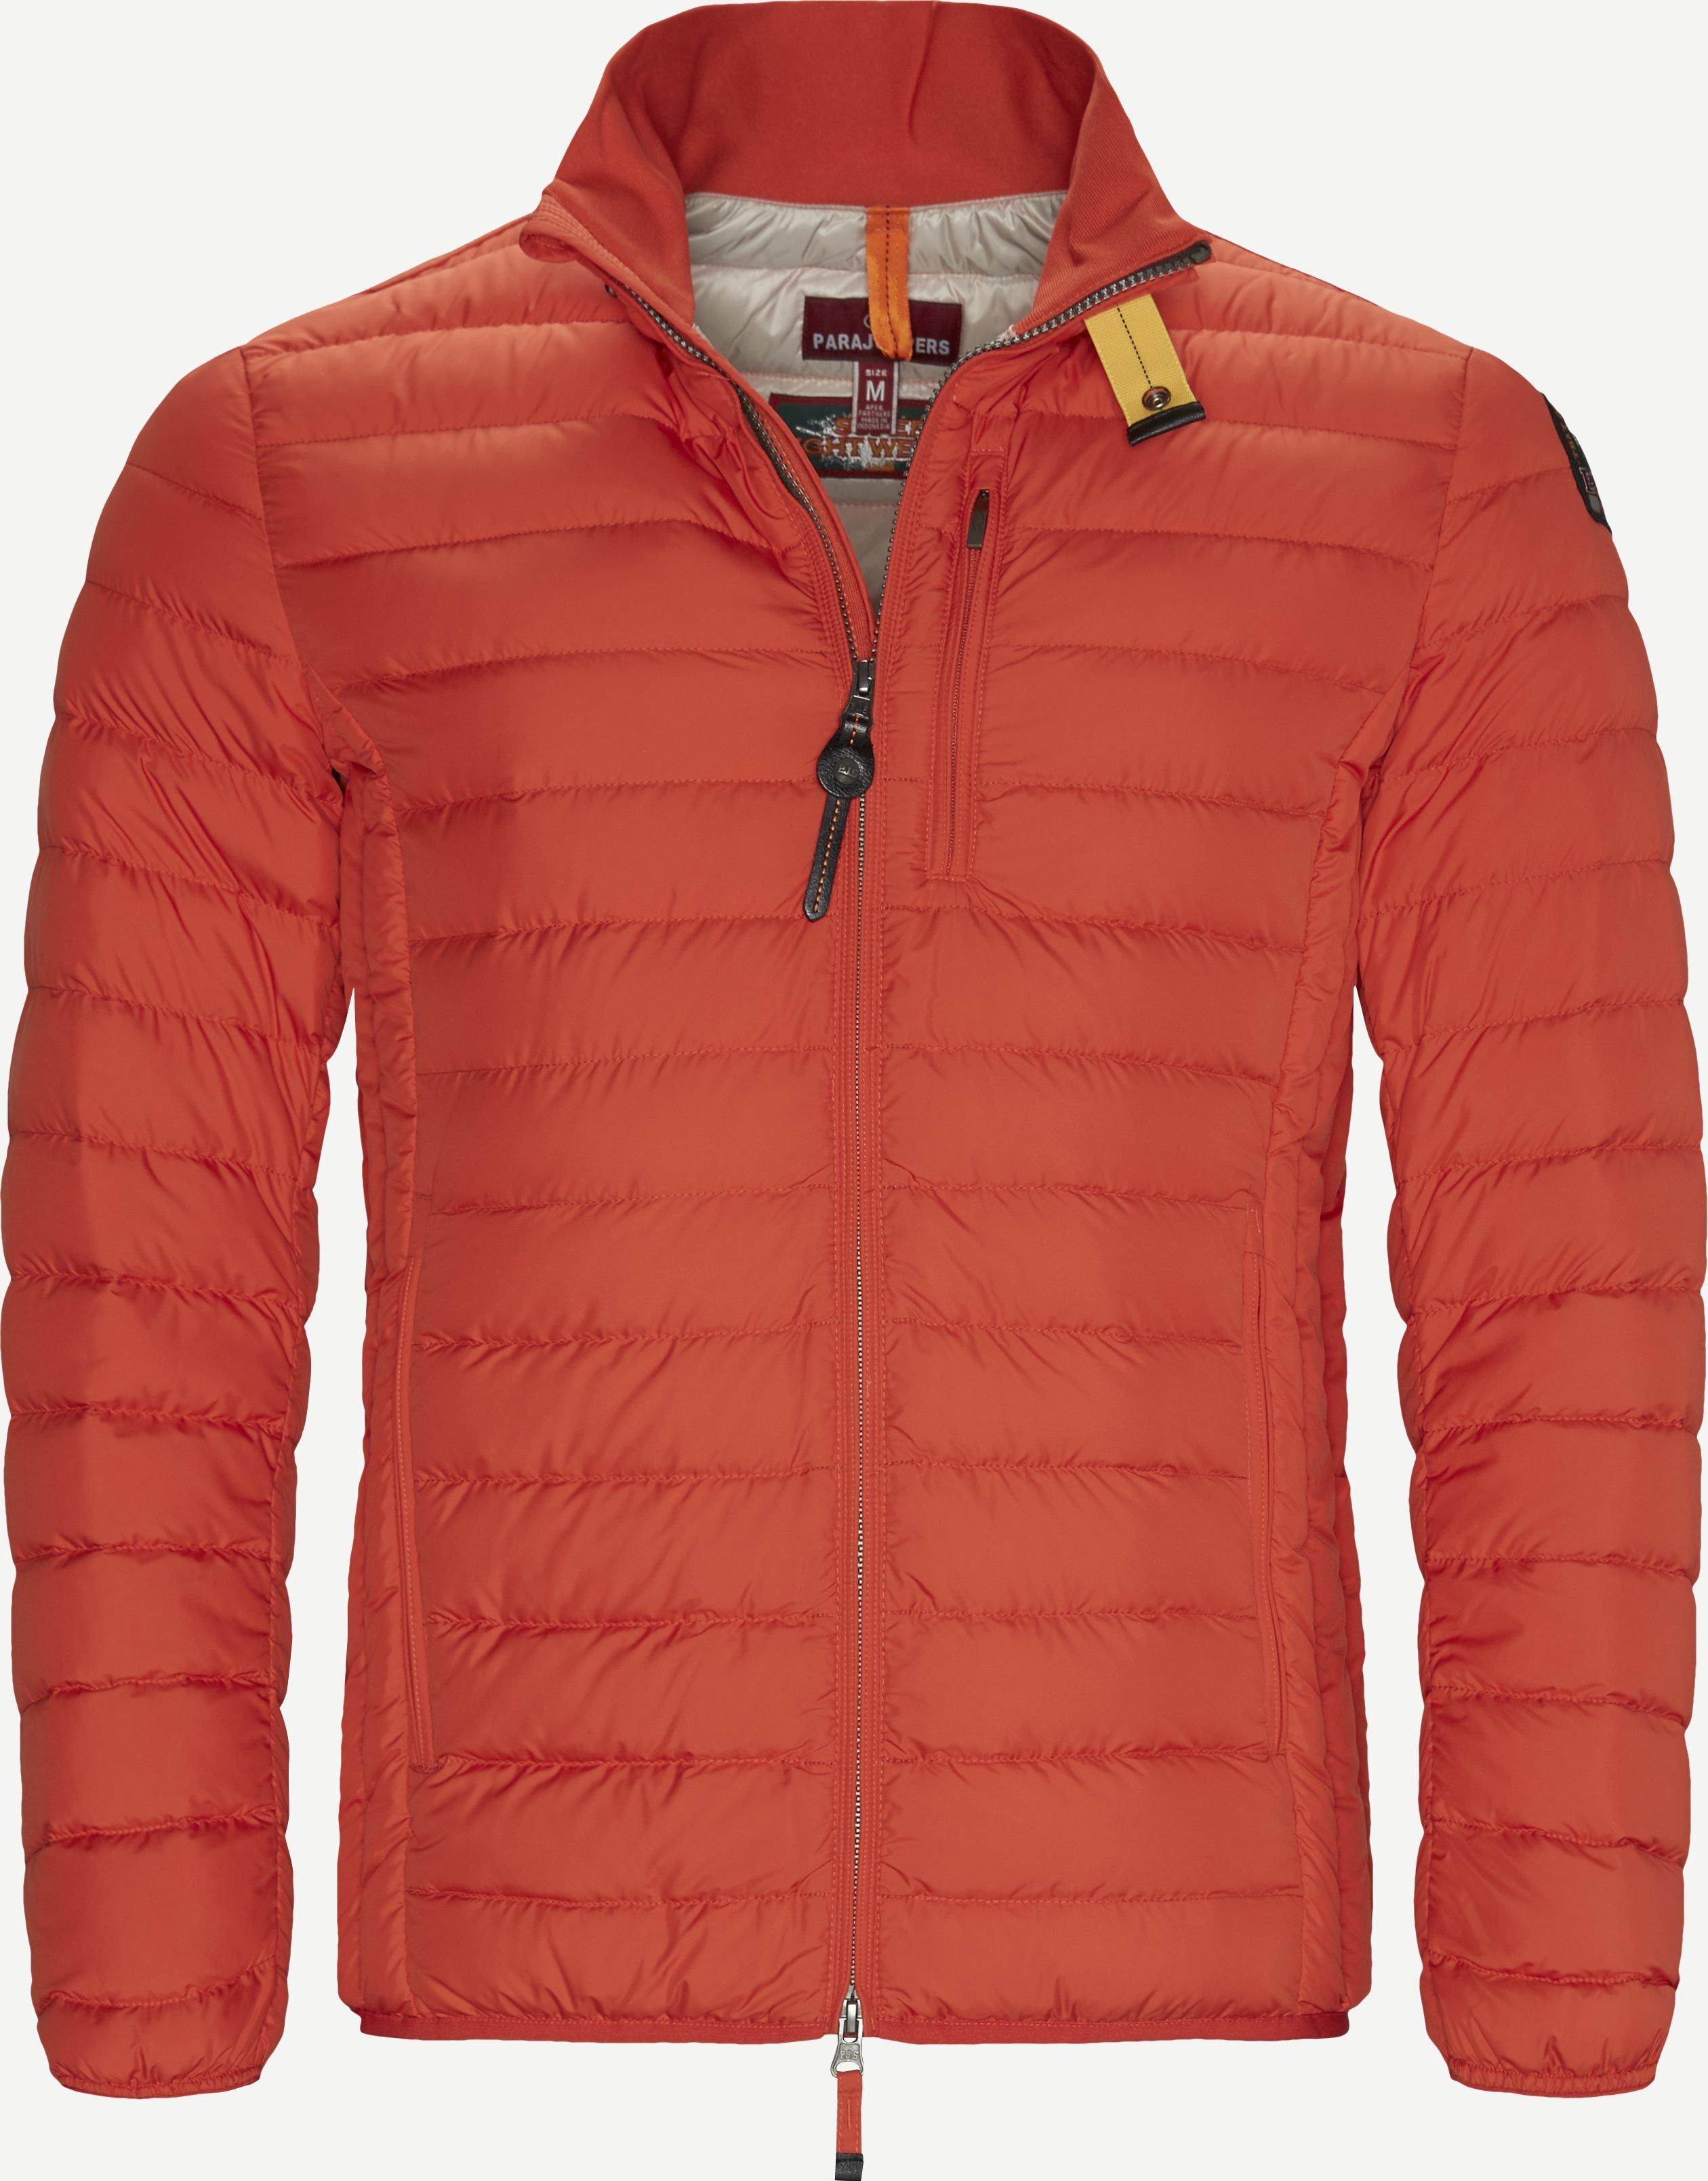 Jackets - Regular - Orange